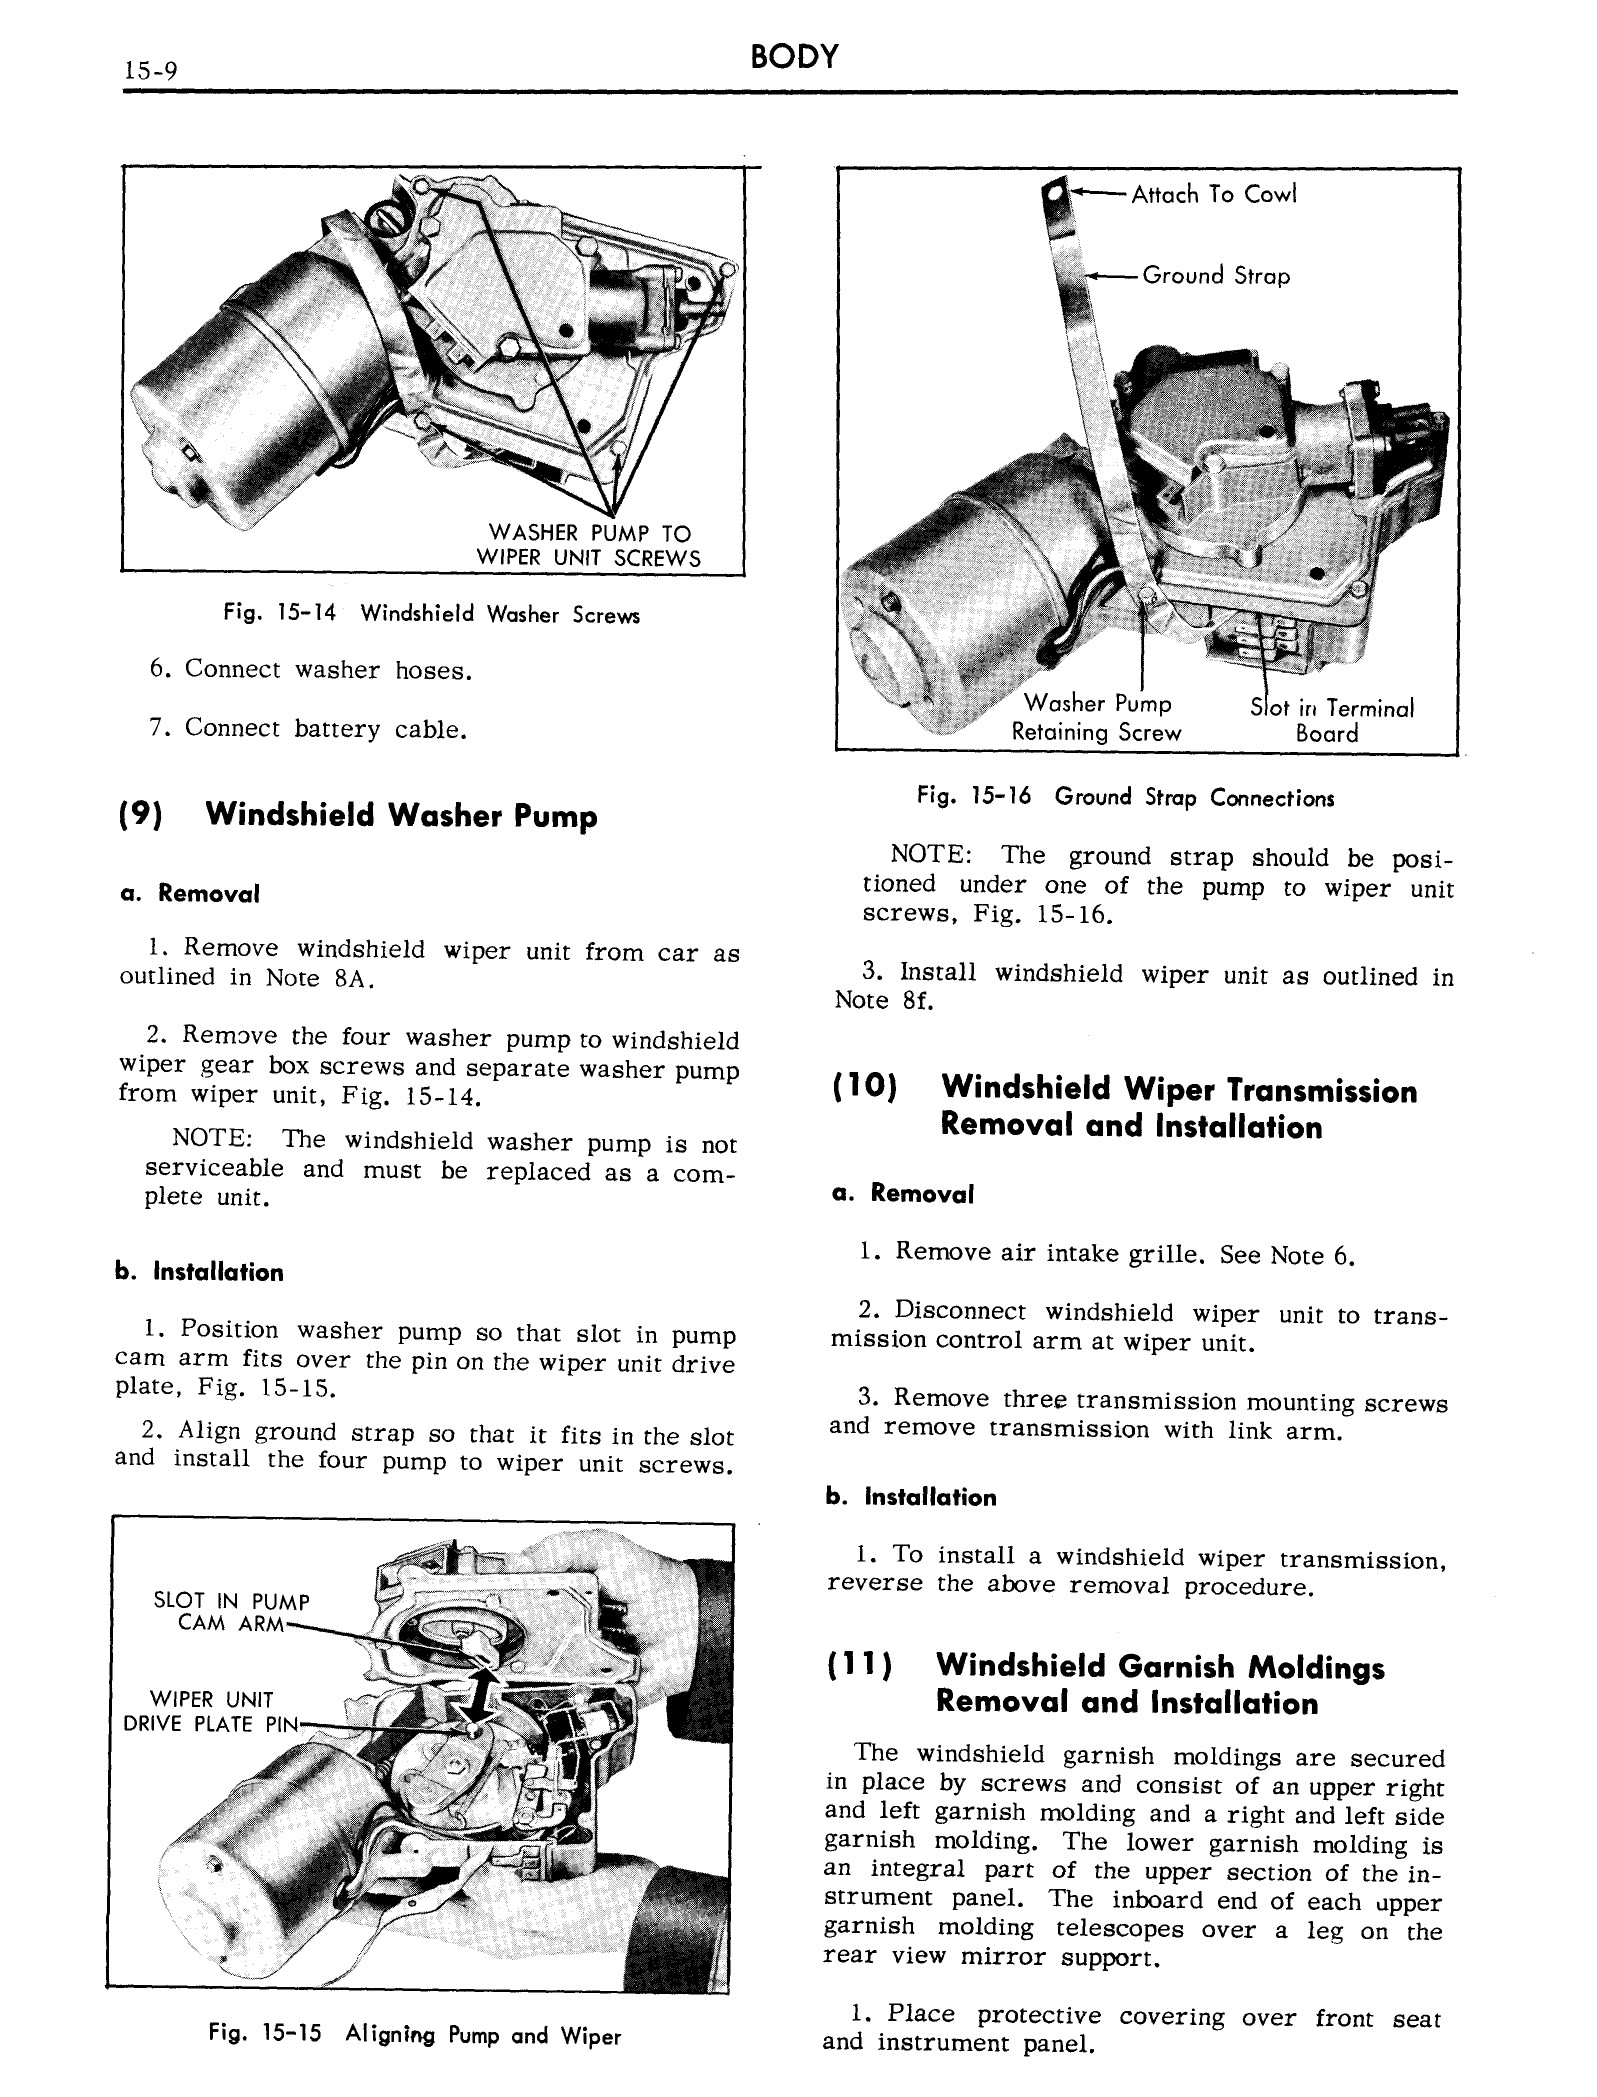 1959 Cadillac Shop Manual- Body Page 9 of 99